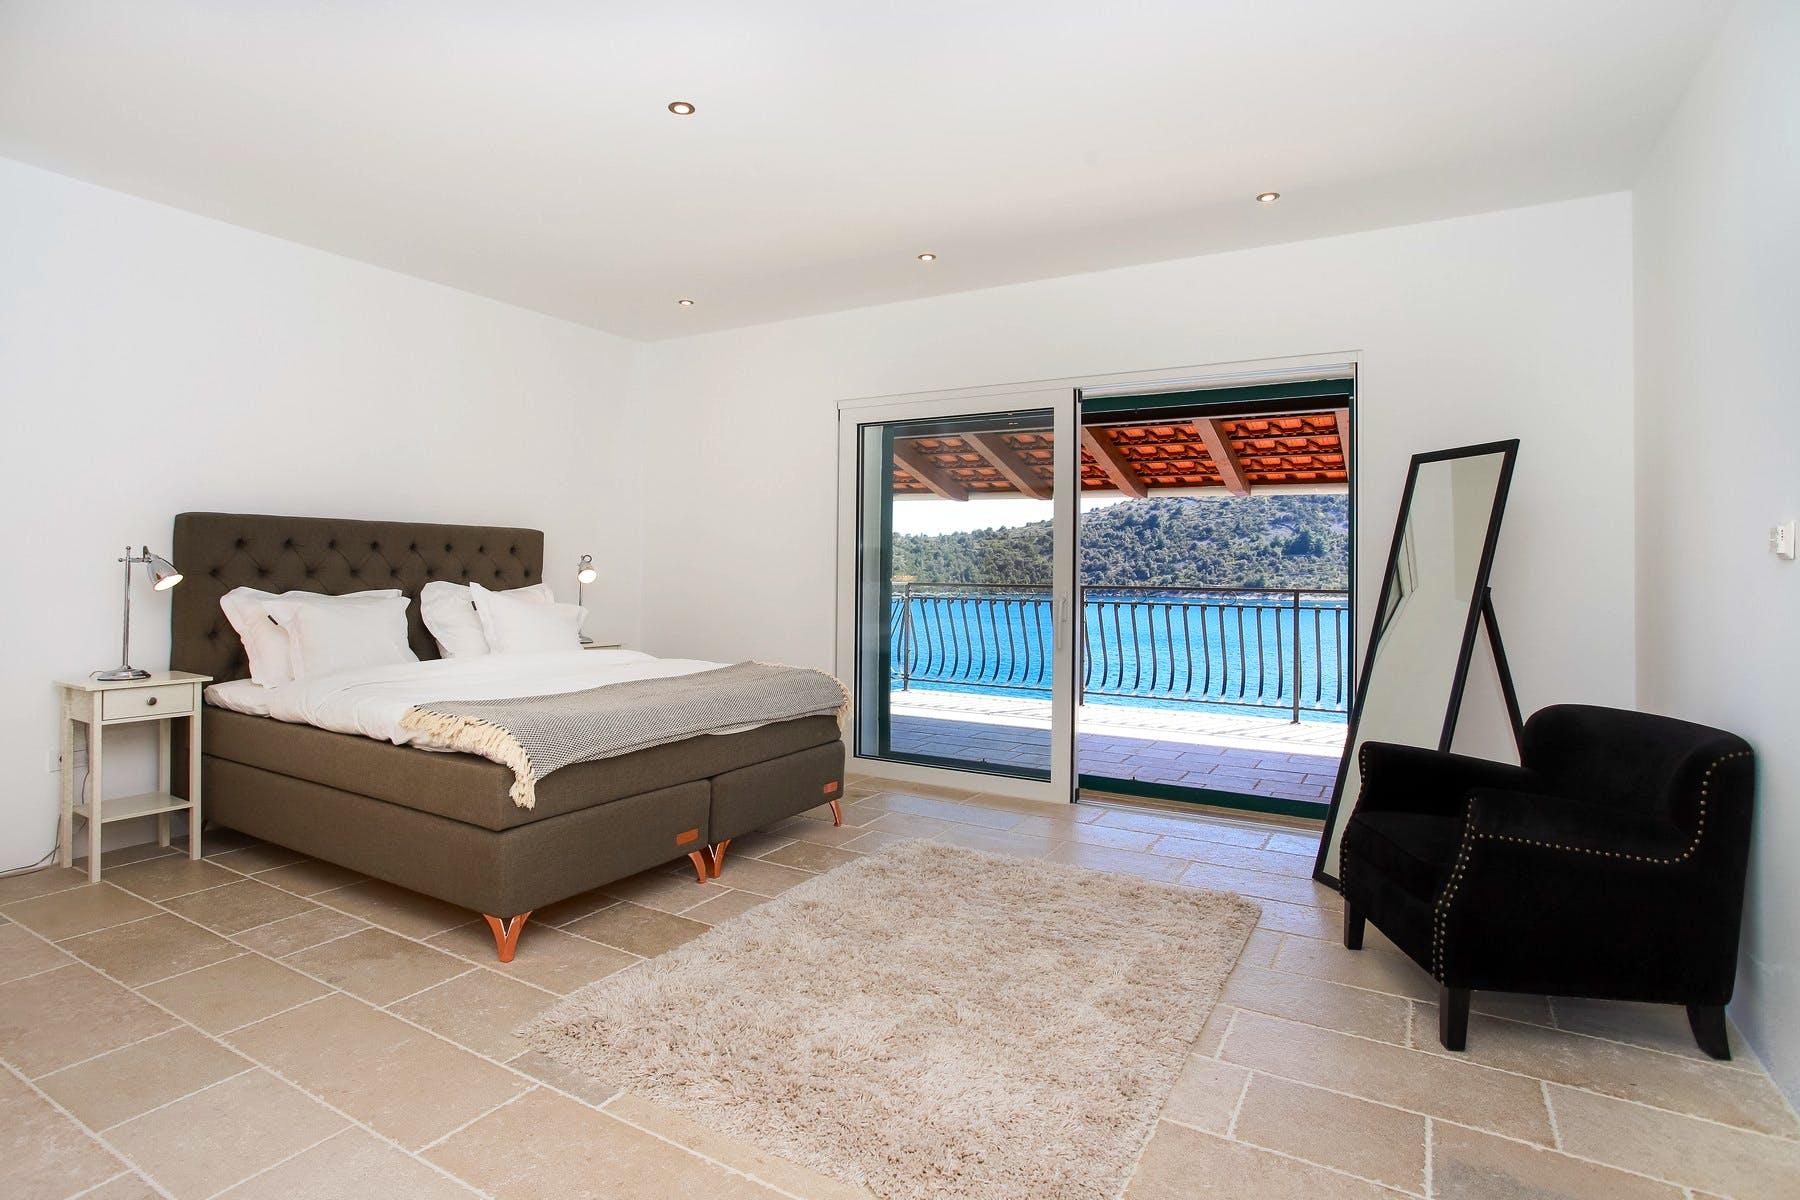 Spacious en-suite bedroom with sea view